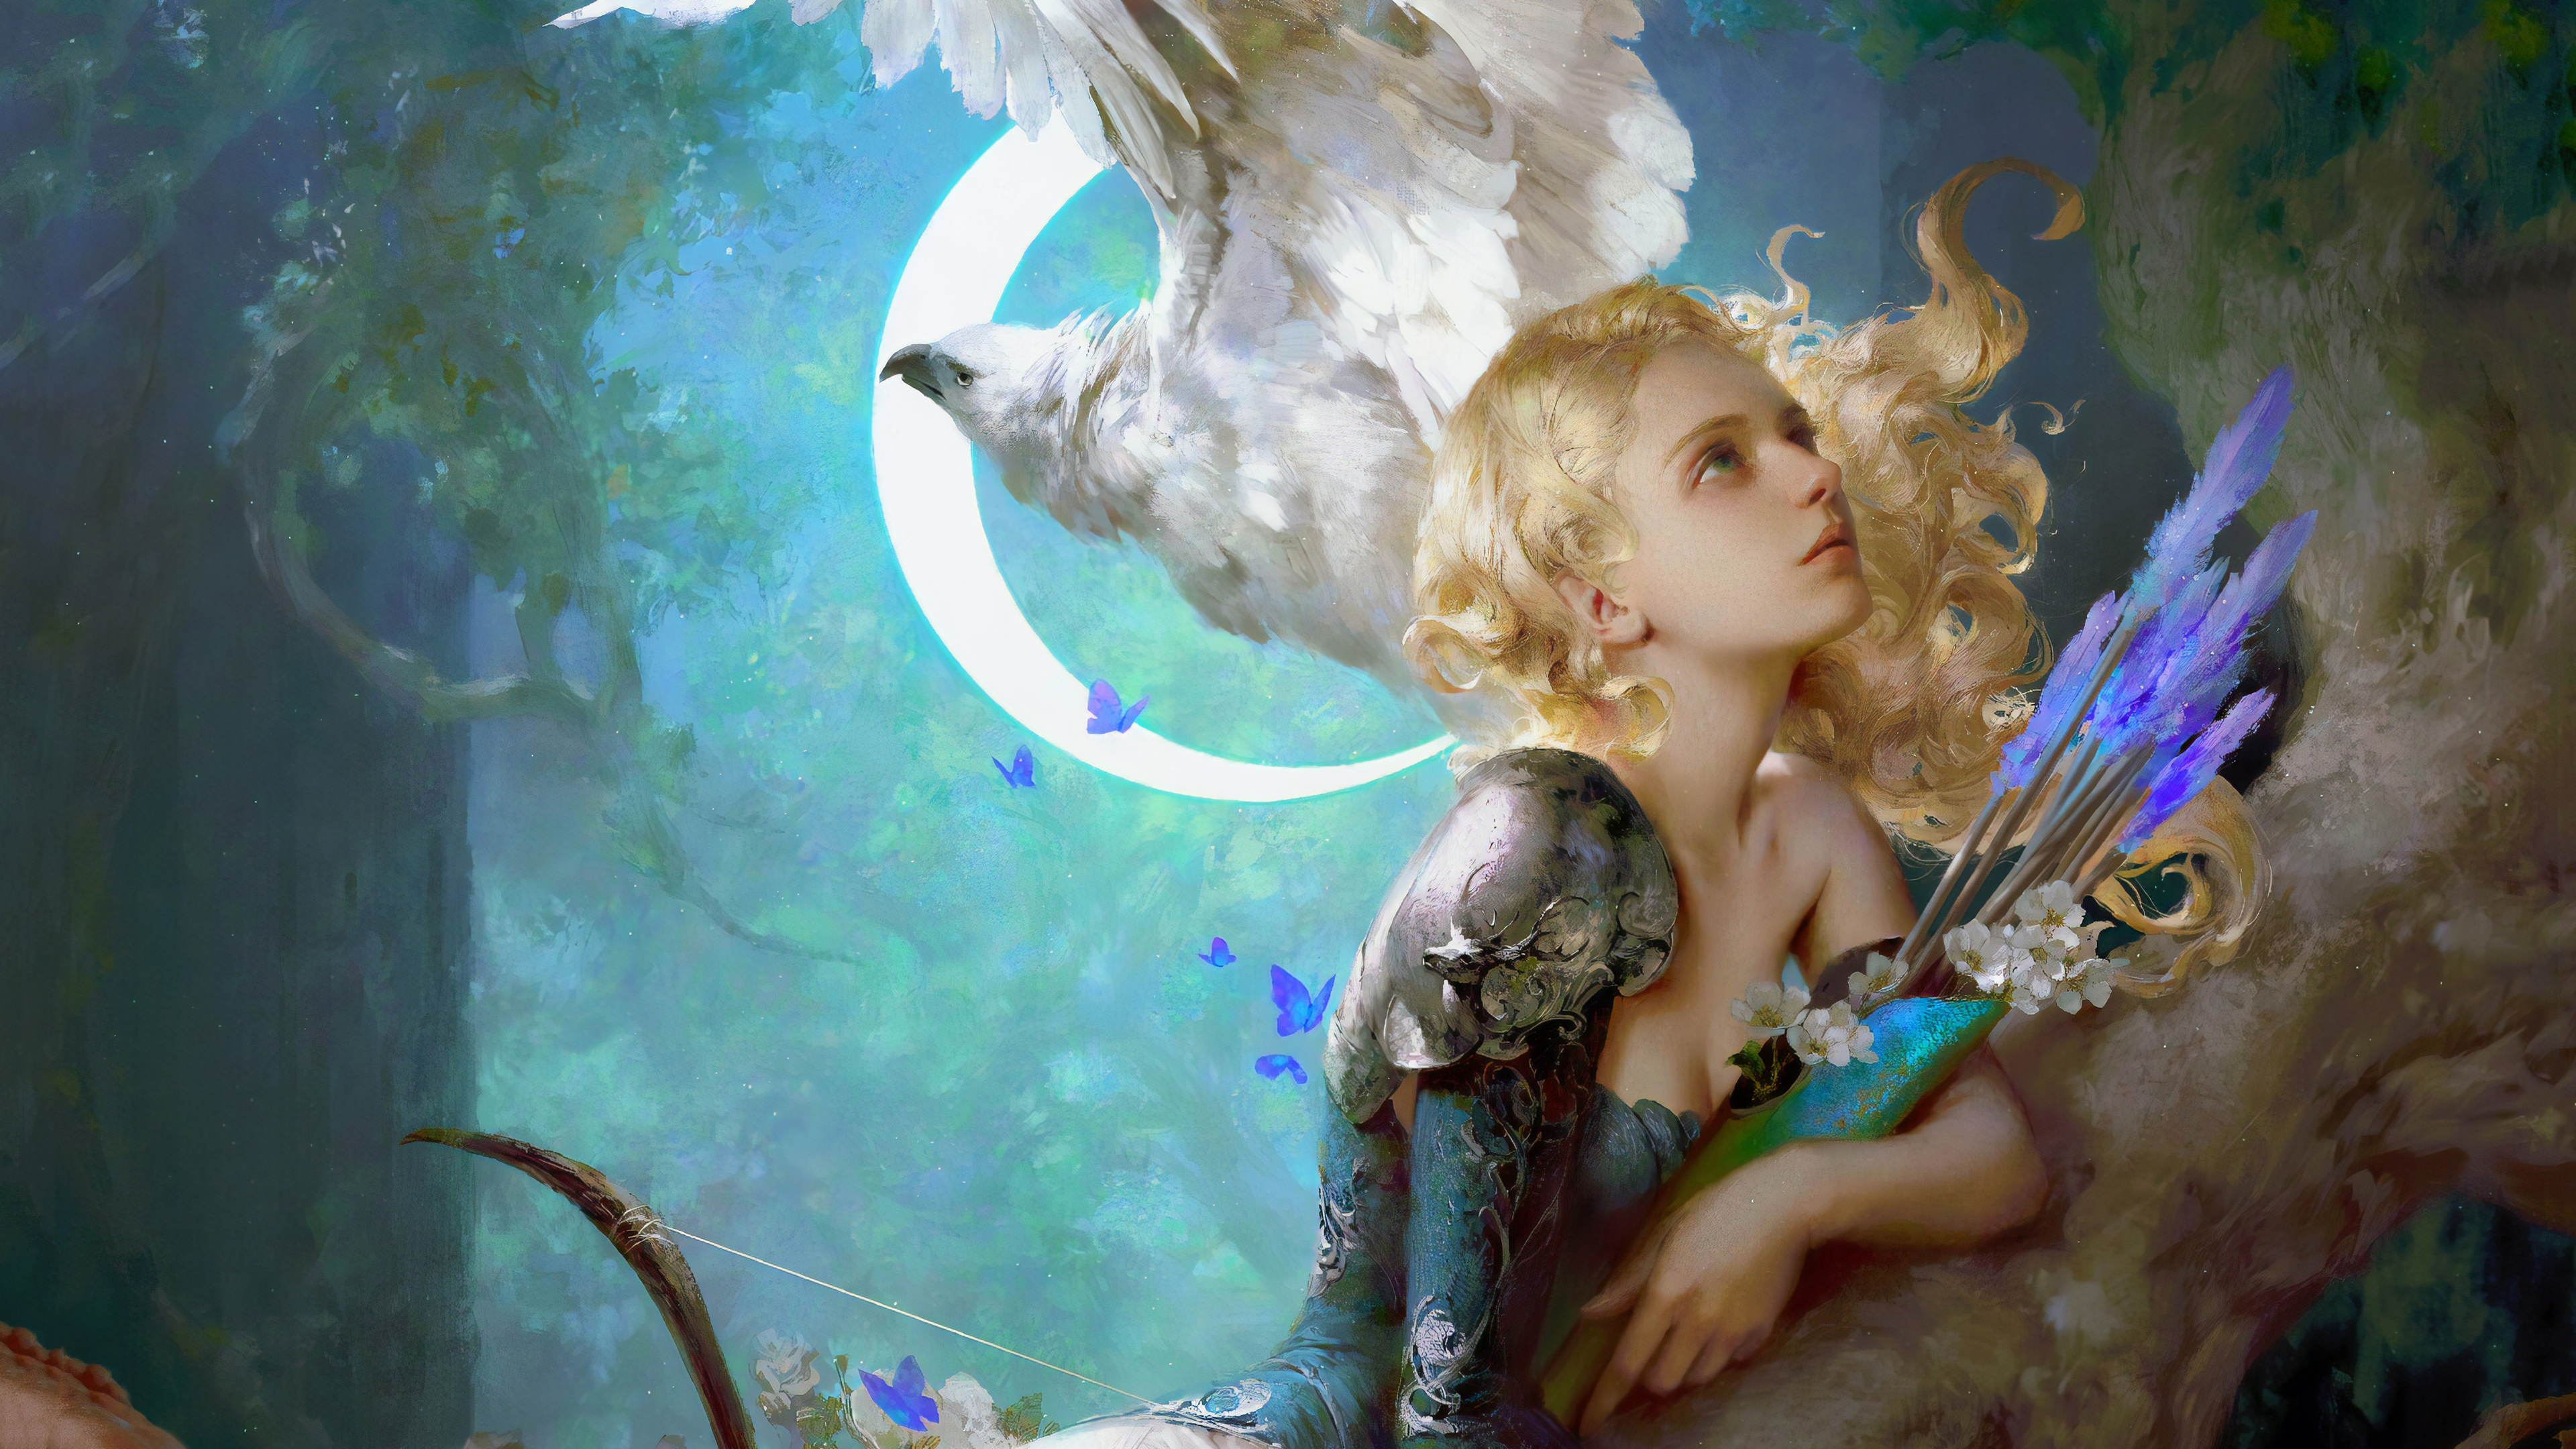 Innocent Angel Fairy Tail 4k, HD Fantasy Girls, 4k ...